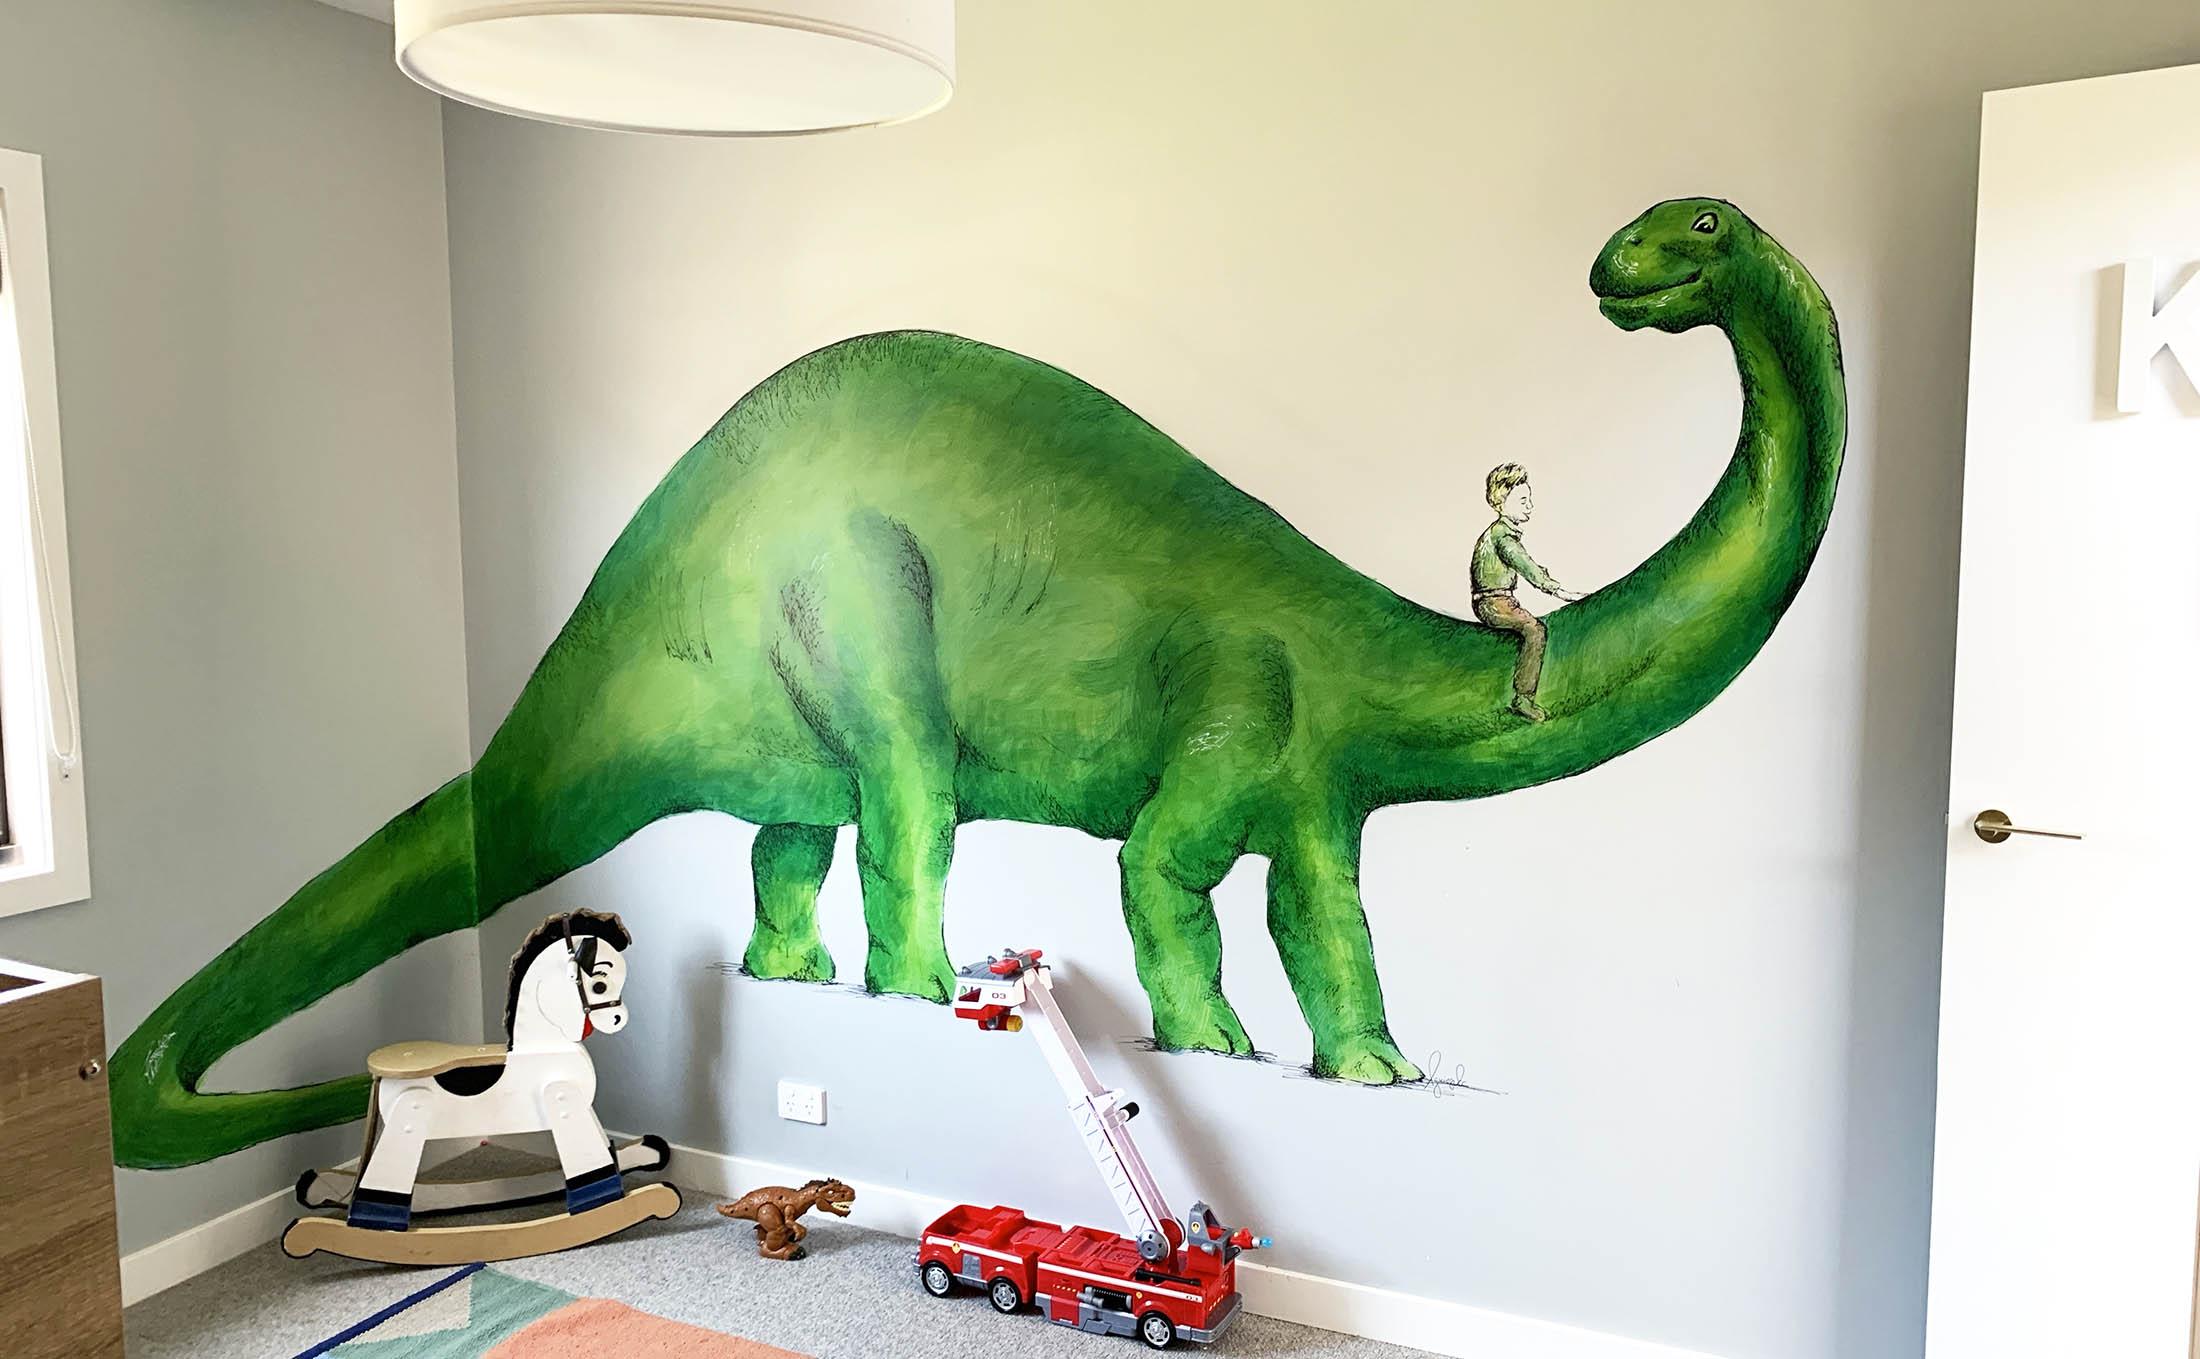 Dinosaur Mural, Relbia, Tasmania   A dinosaur mural for little boys new bedroom.